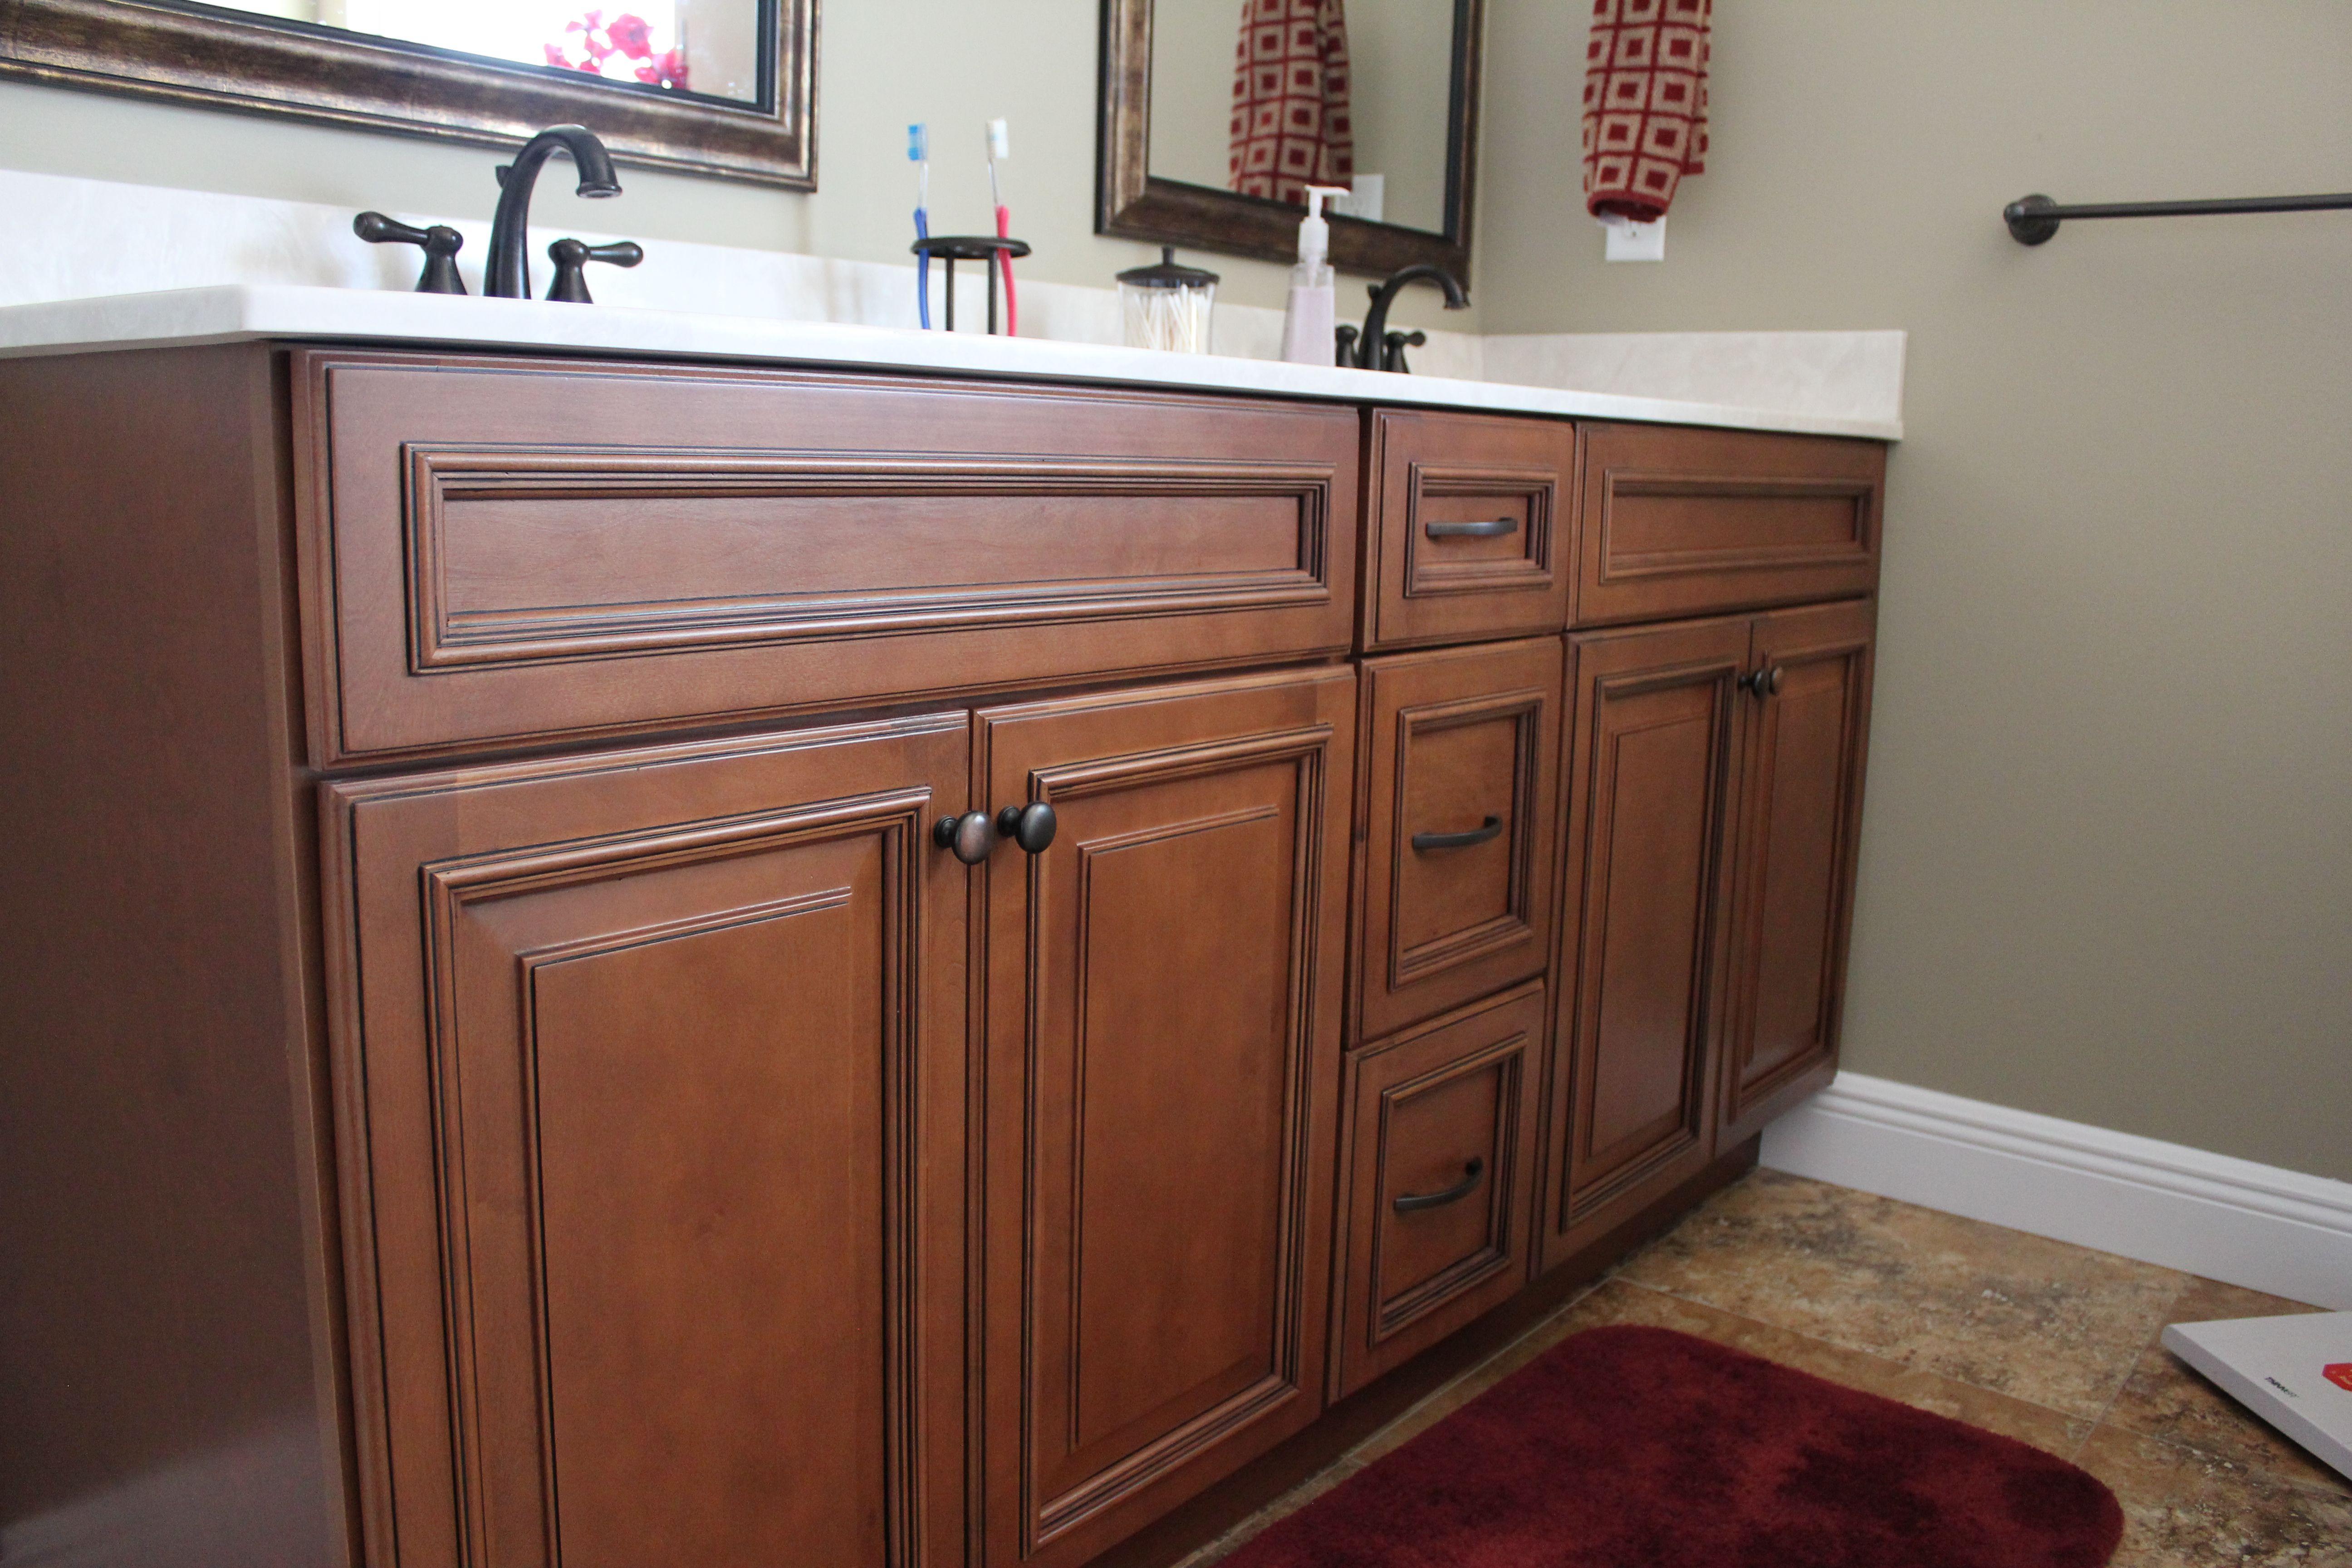 Fabuwood Cabinets Bathroom Cabinetry Cinnamon Glaze